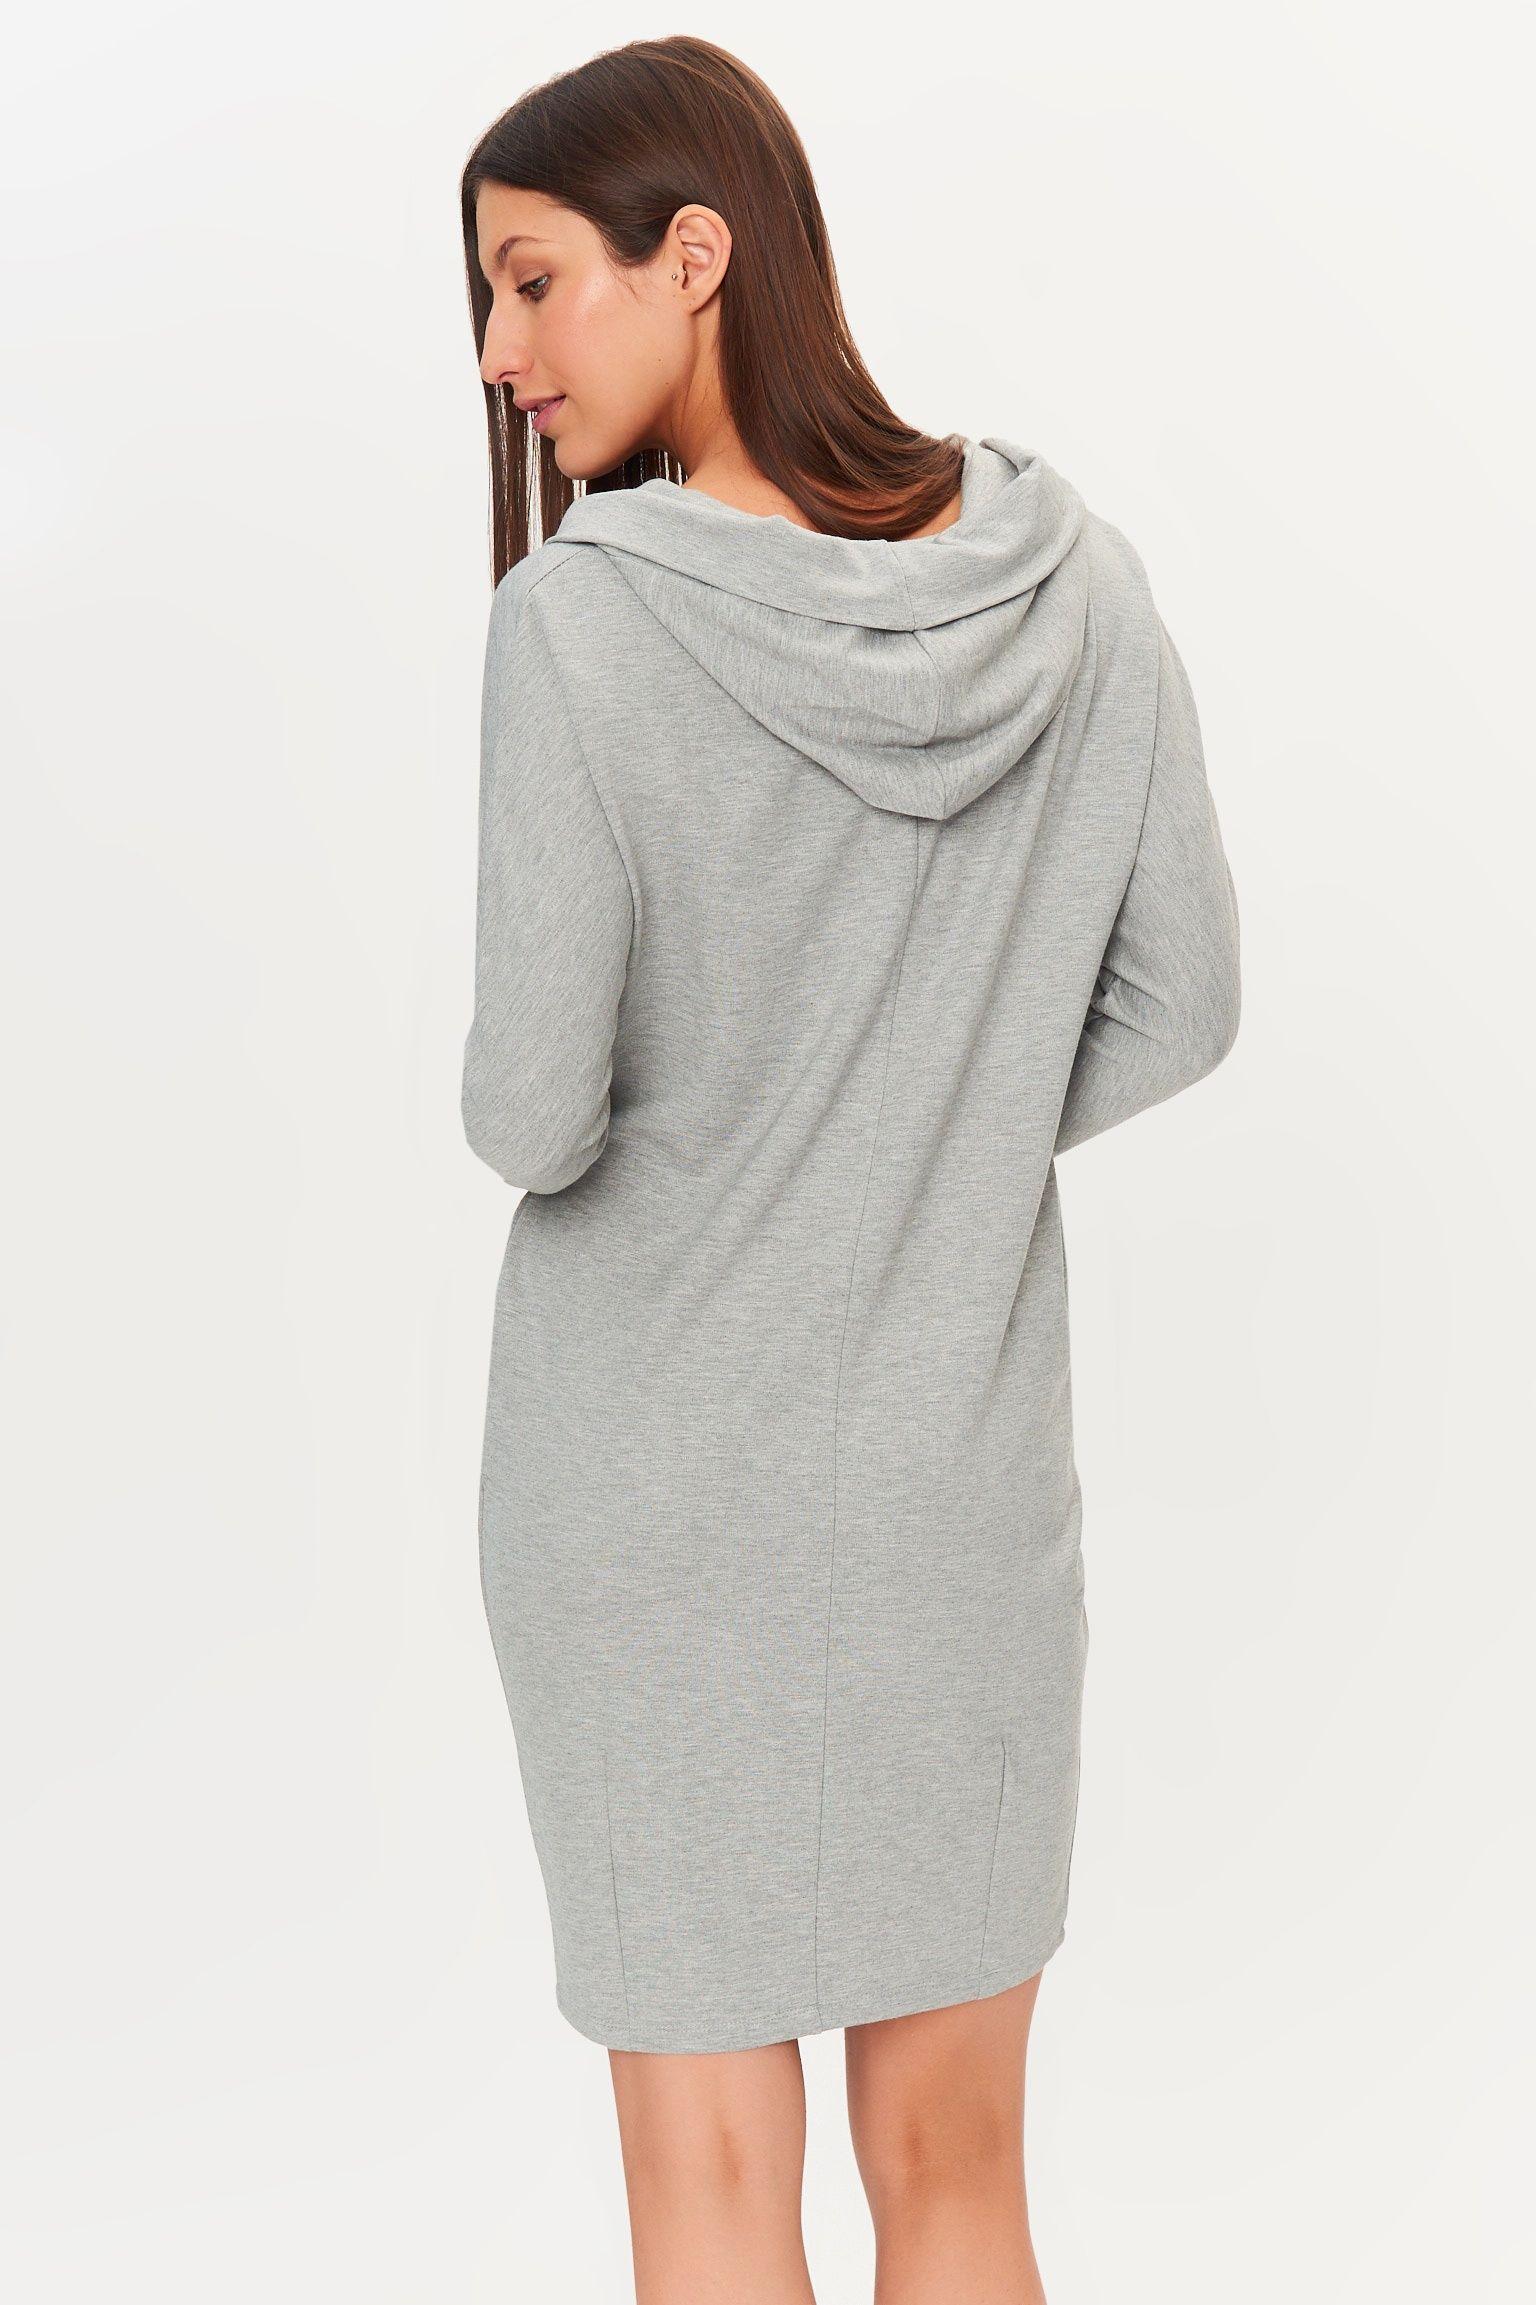 28f72c8c15 Tatuum Awalia 1 jasnoszara sukienka z kapturem kolor  szary (dzianina   wiskoza 70